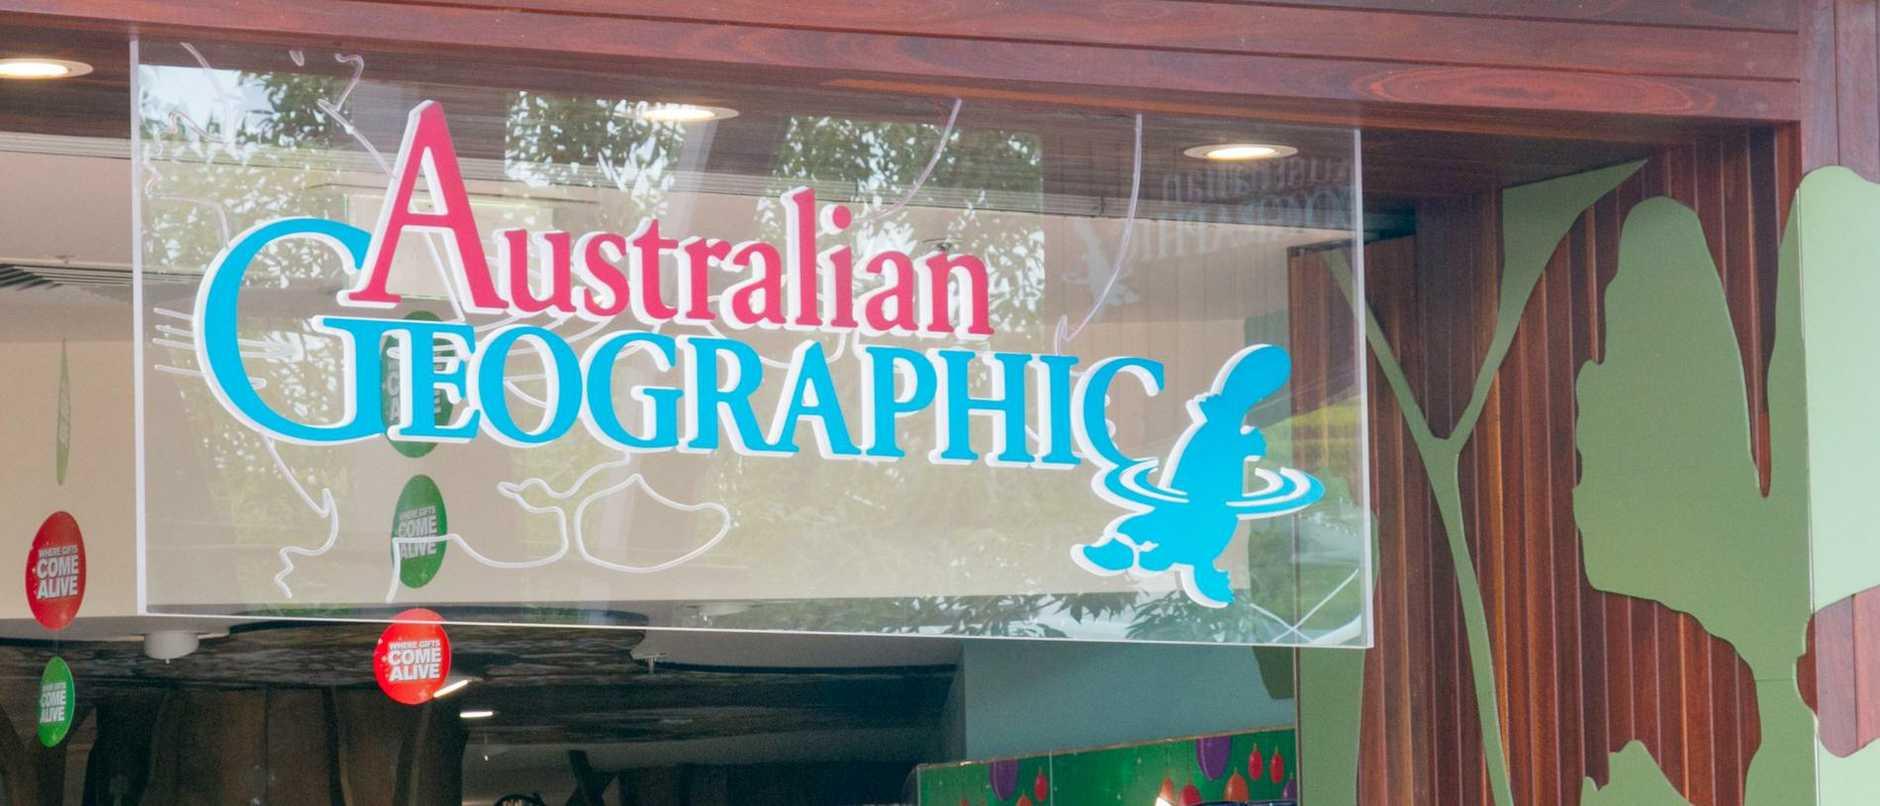 Australian geographic store in warringah mall shopping centre,sydney,australia